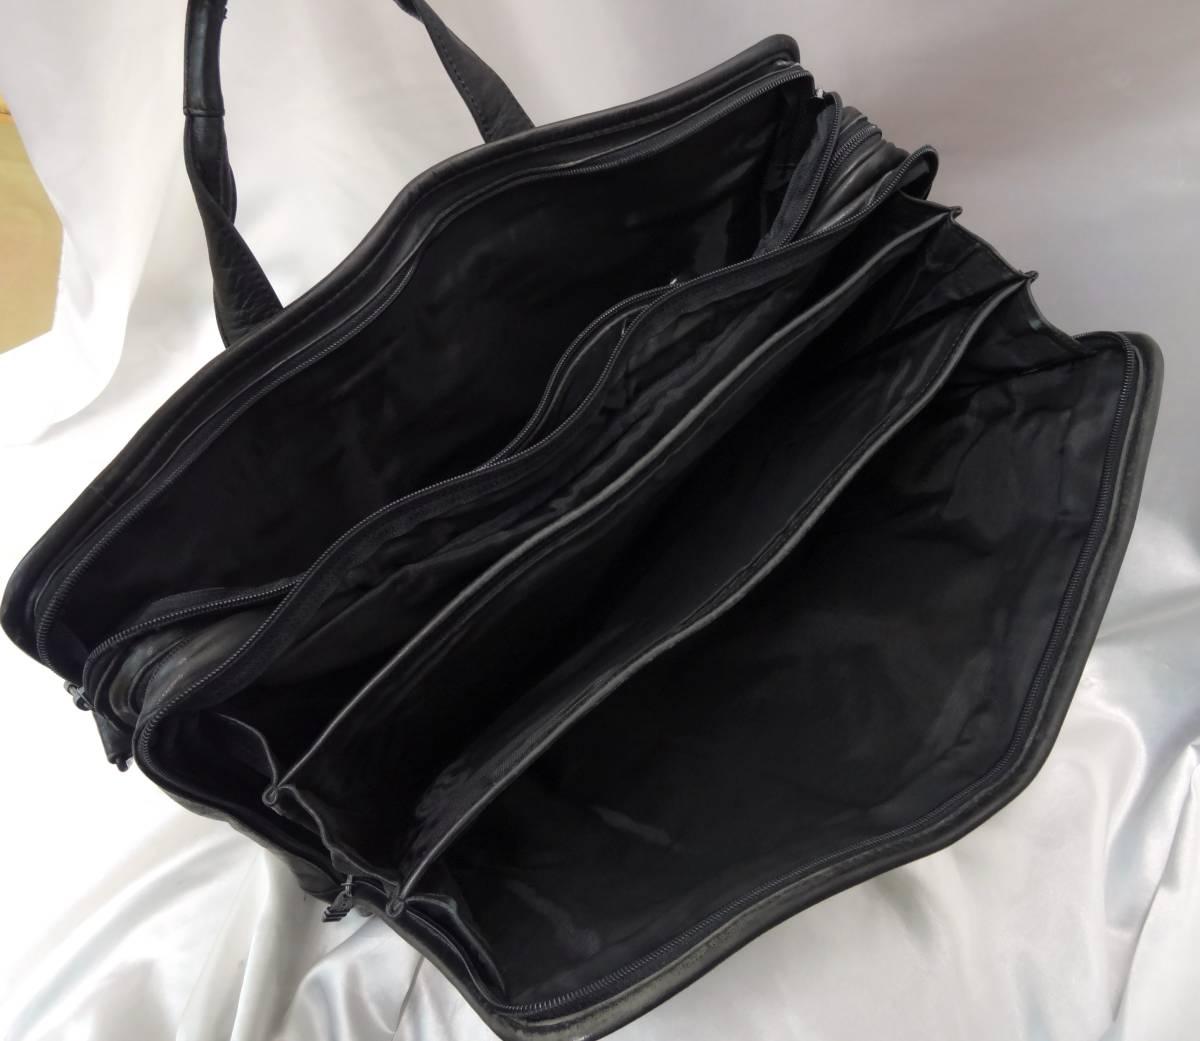 TUMI トゥミ ★ ブリーフバッグ・書類バッグ ★ 本革素材 ★ ブラック_画像9